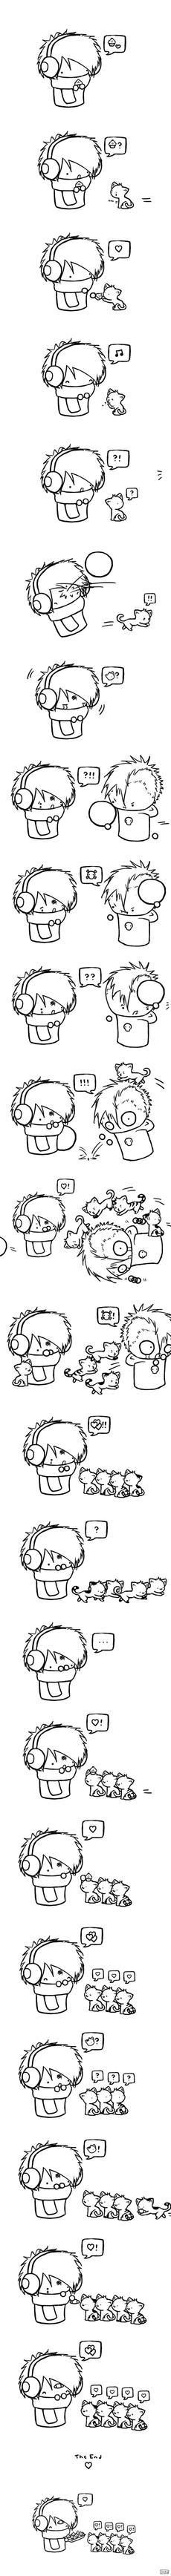 Cupcake - A Tiny Comic by 0xo